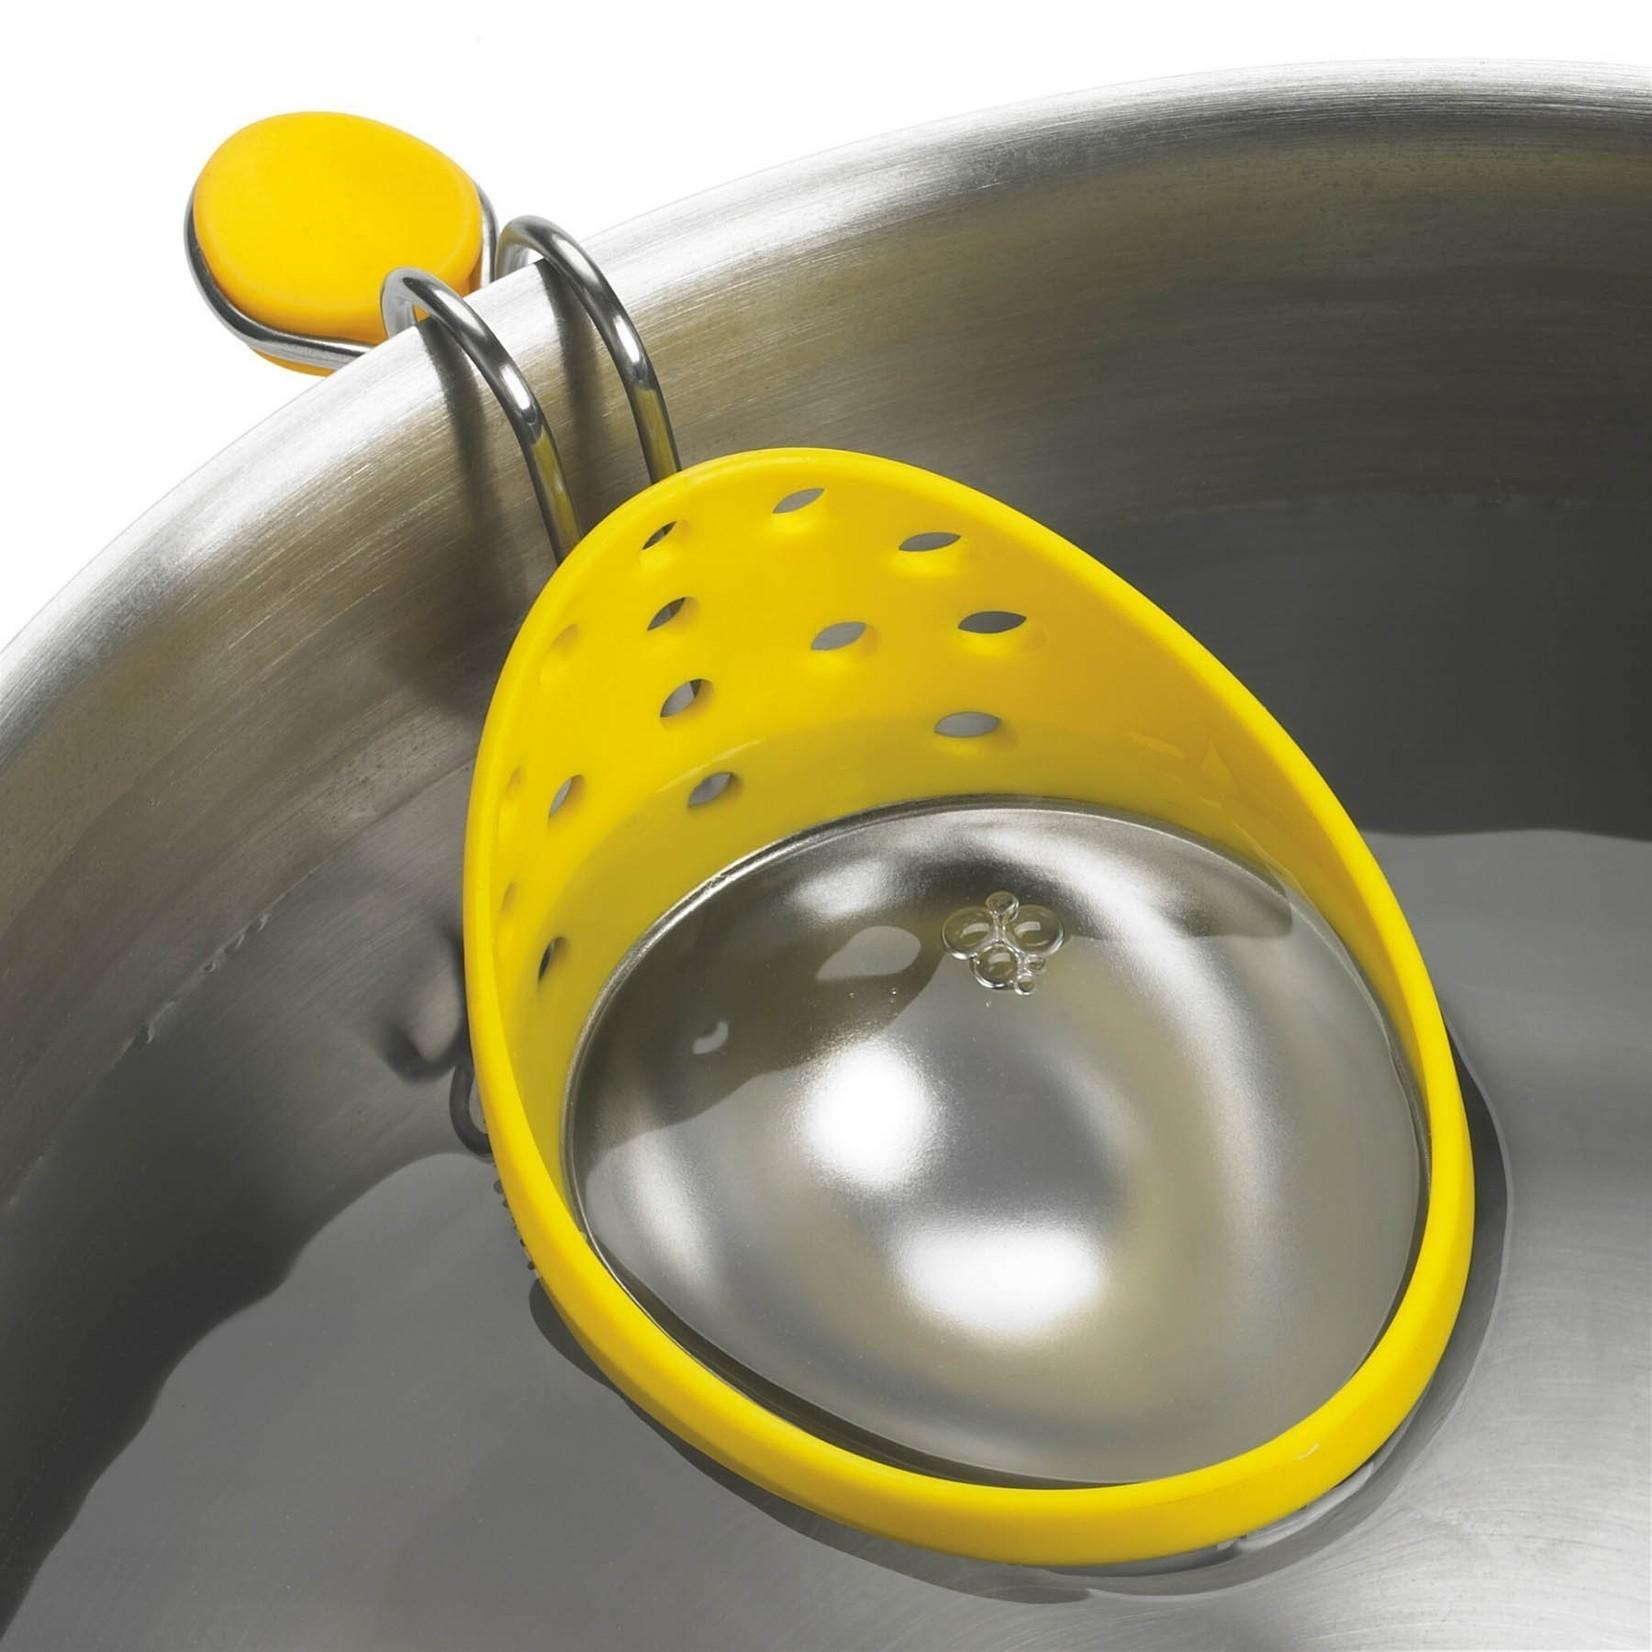 Cuisipro Stainless Steel Egg Poacher Set